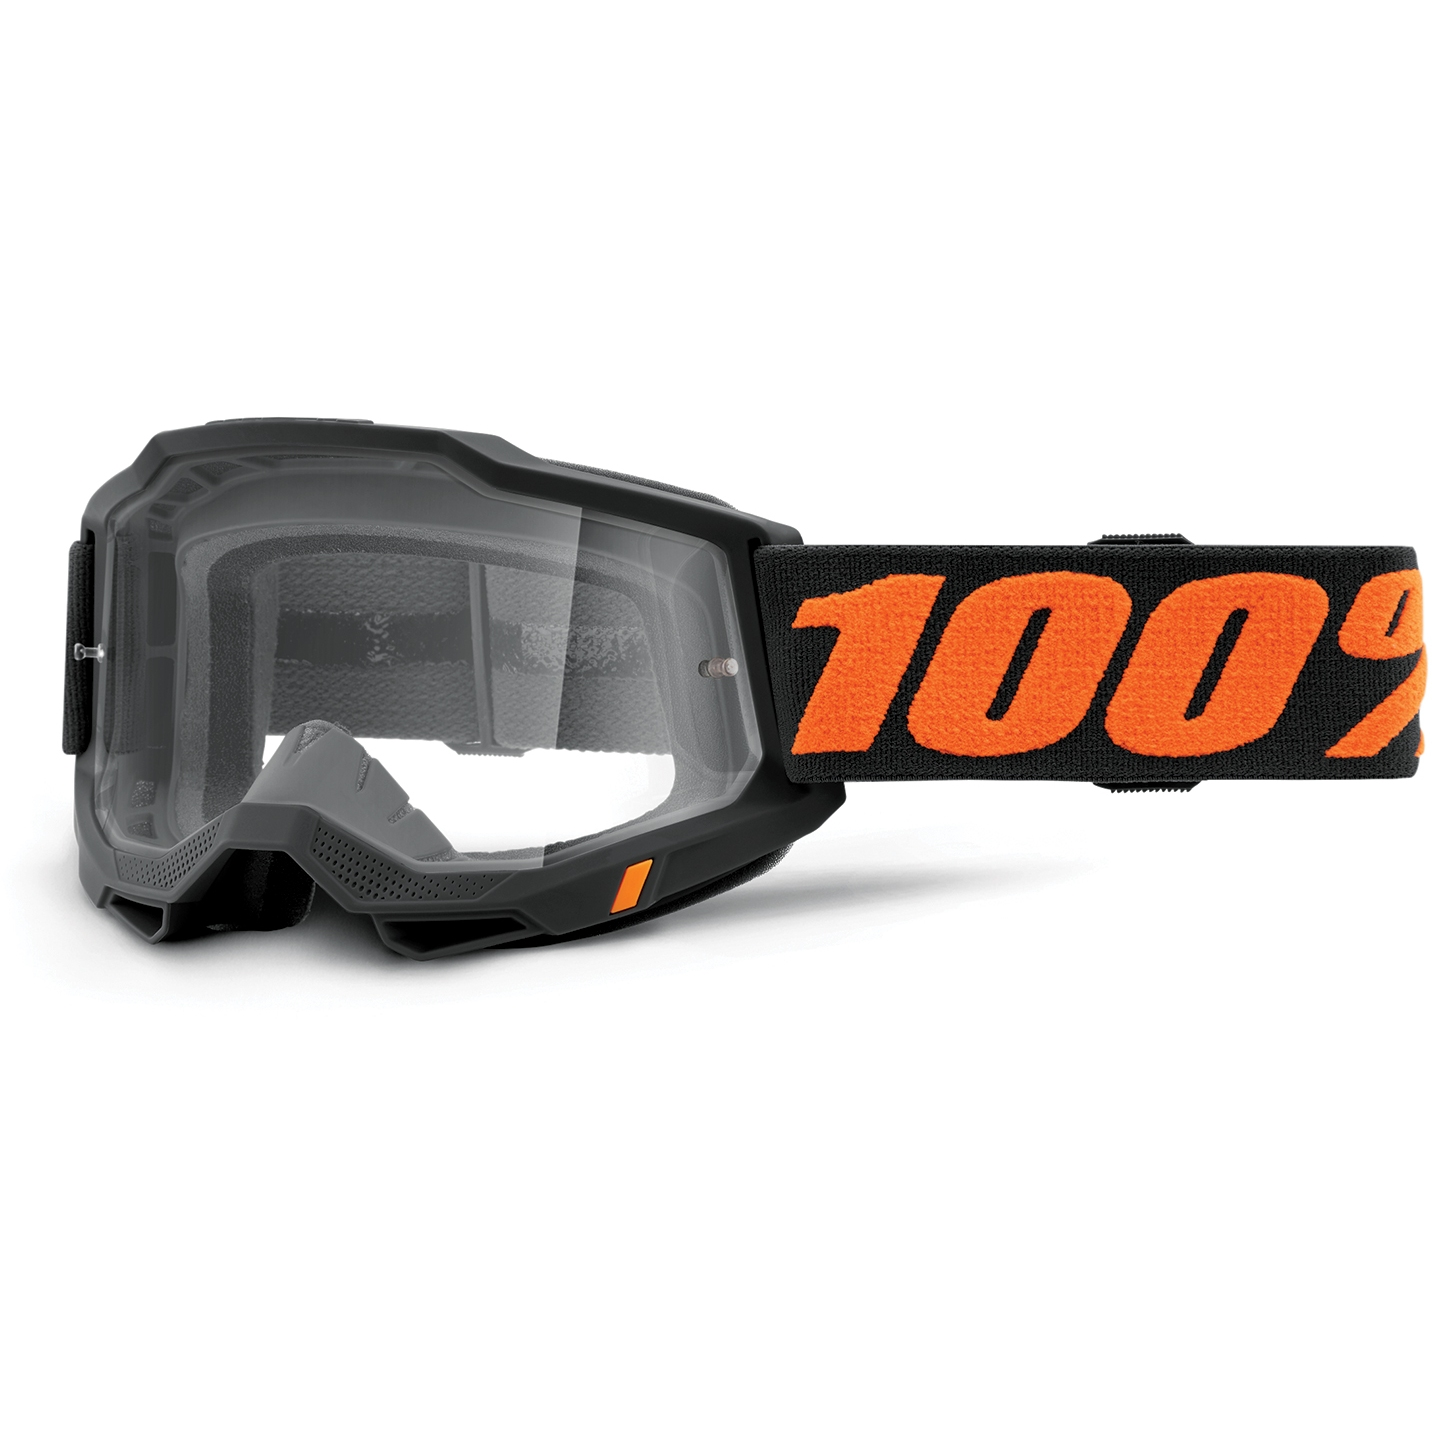 100% Accuri 2 Goggle Clear Lens Gafas - Chicago